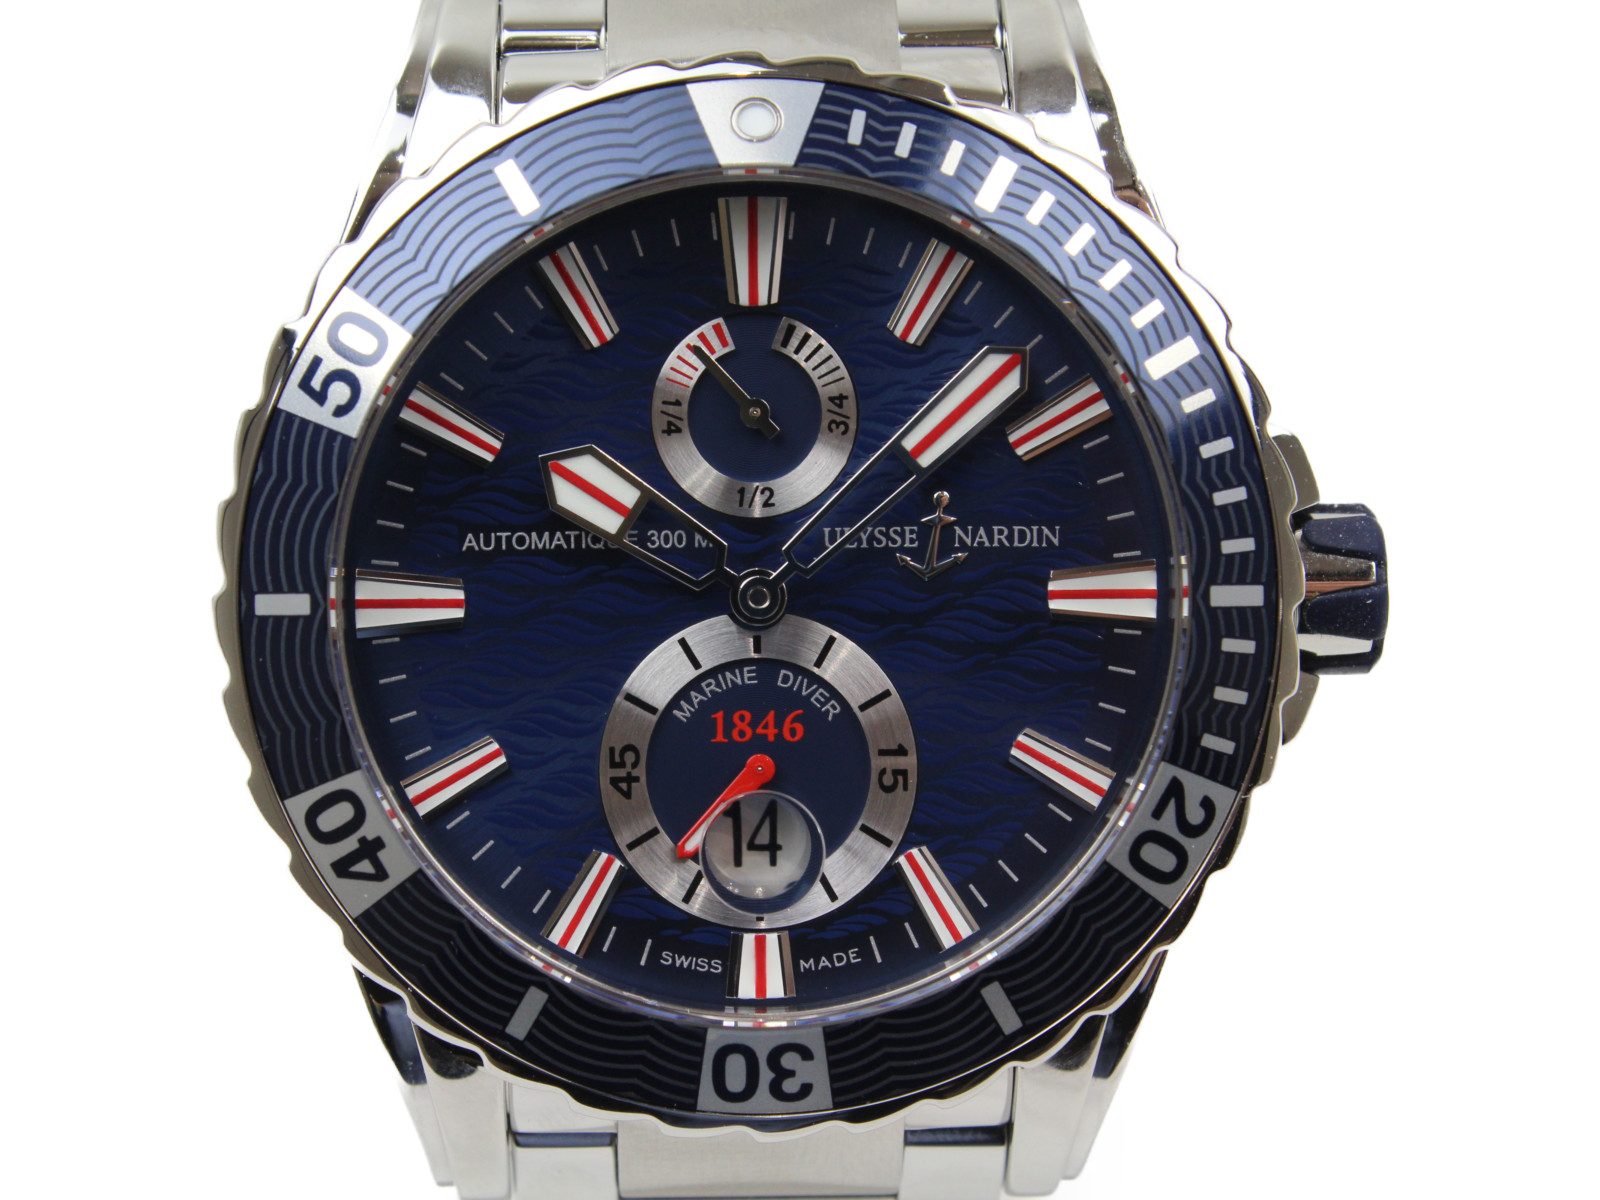 ULYSSE NARDIN ユリスナルダン マリーンダイバー 263-10-7M/39 自動巻き デイト SS ブルー メンズ 腕時計【中古】